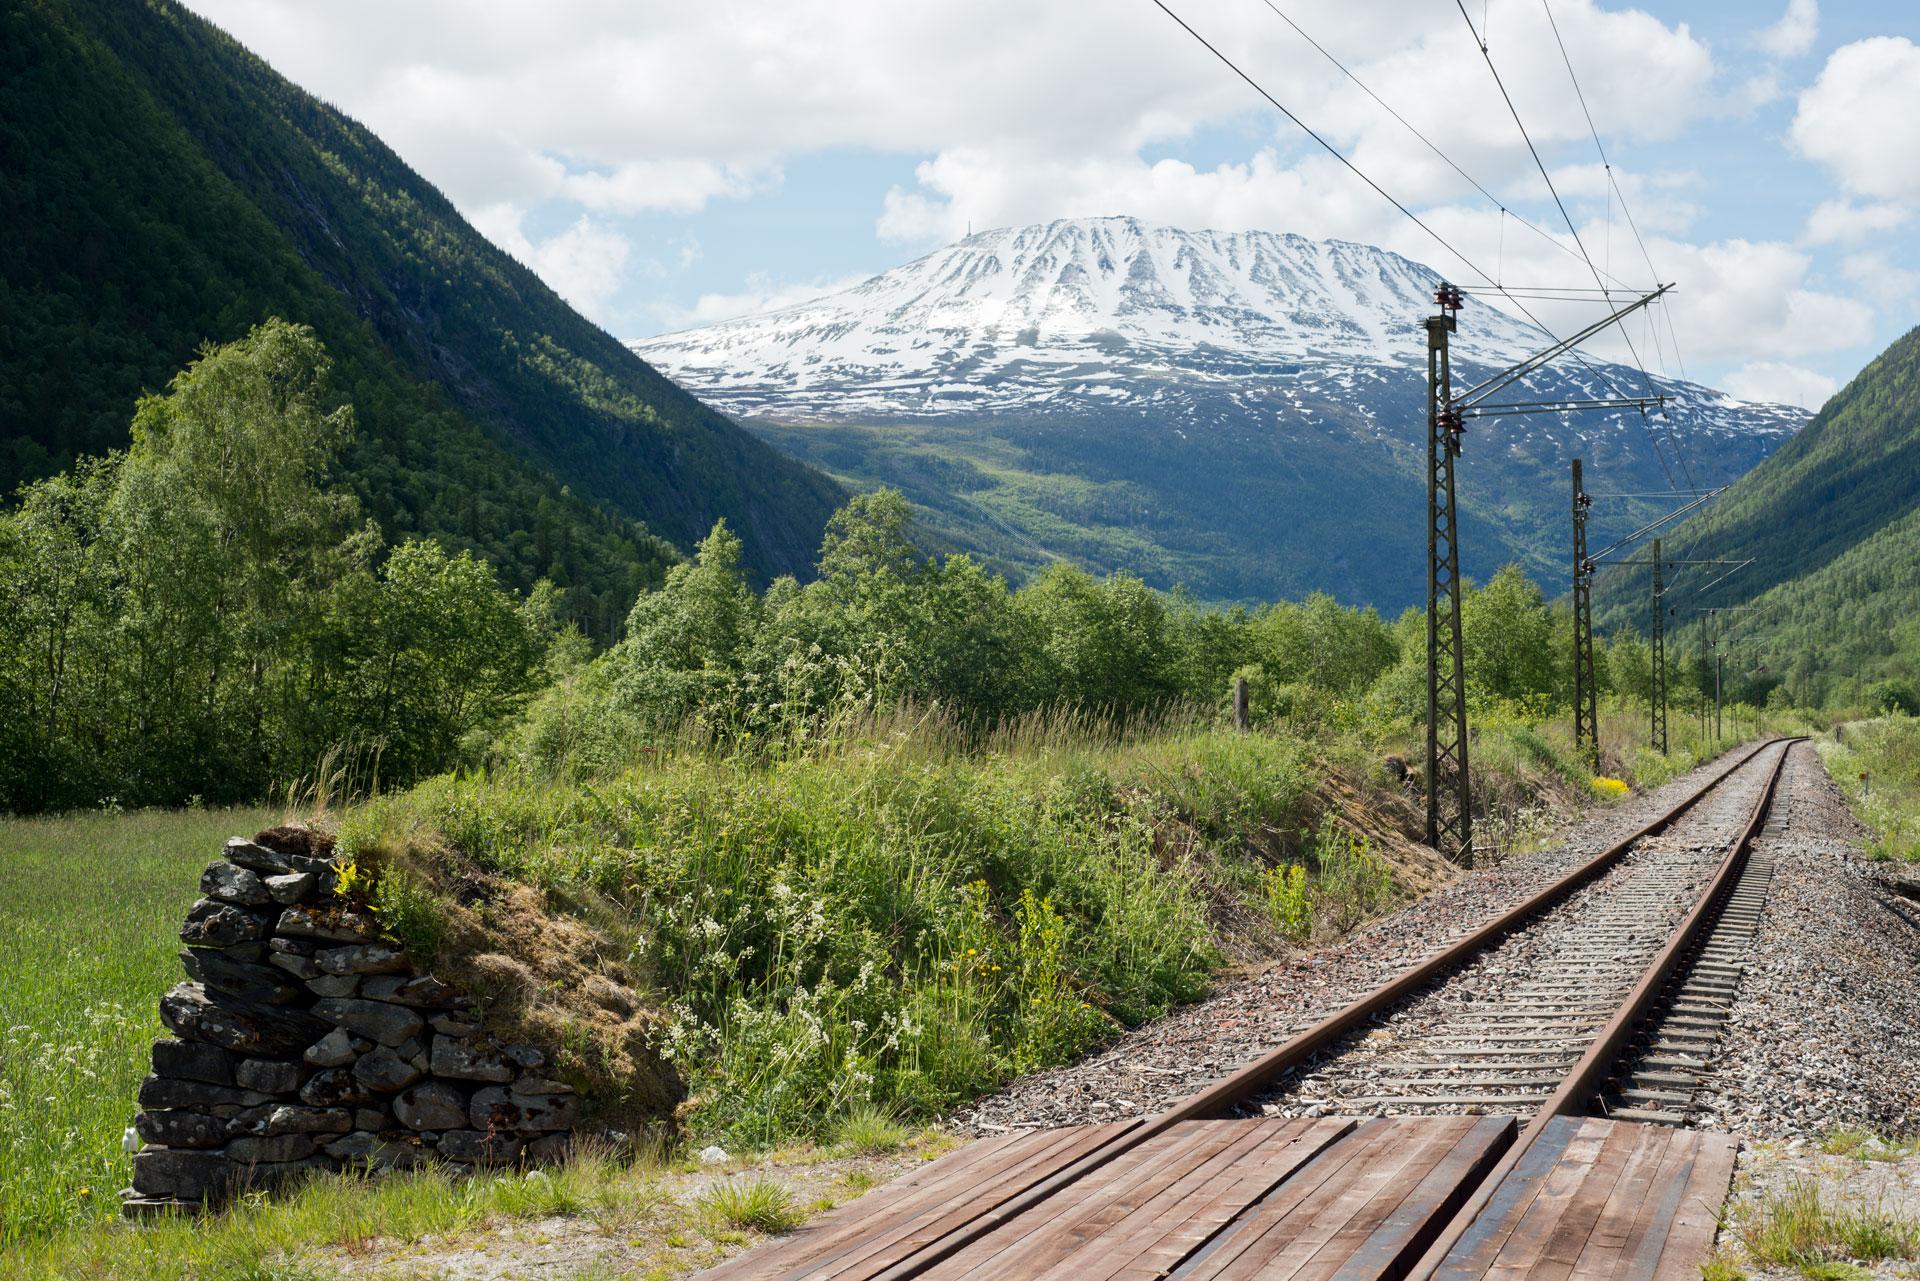 Vindmur ved Rjukanbanen Miland. Gaustatoppen. Foto: Per Berntsen©Riksantikvaren